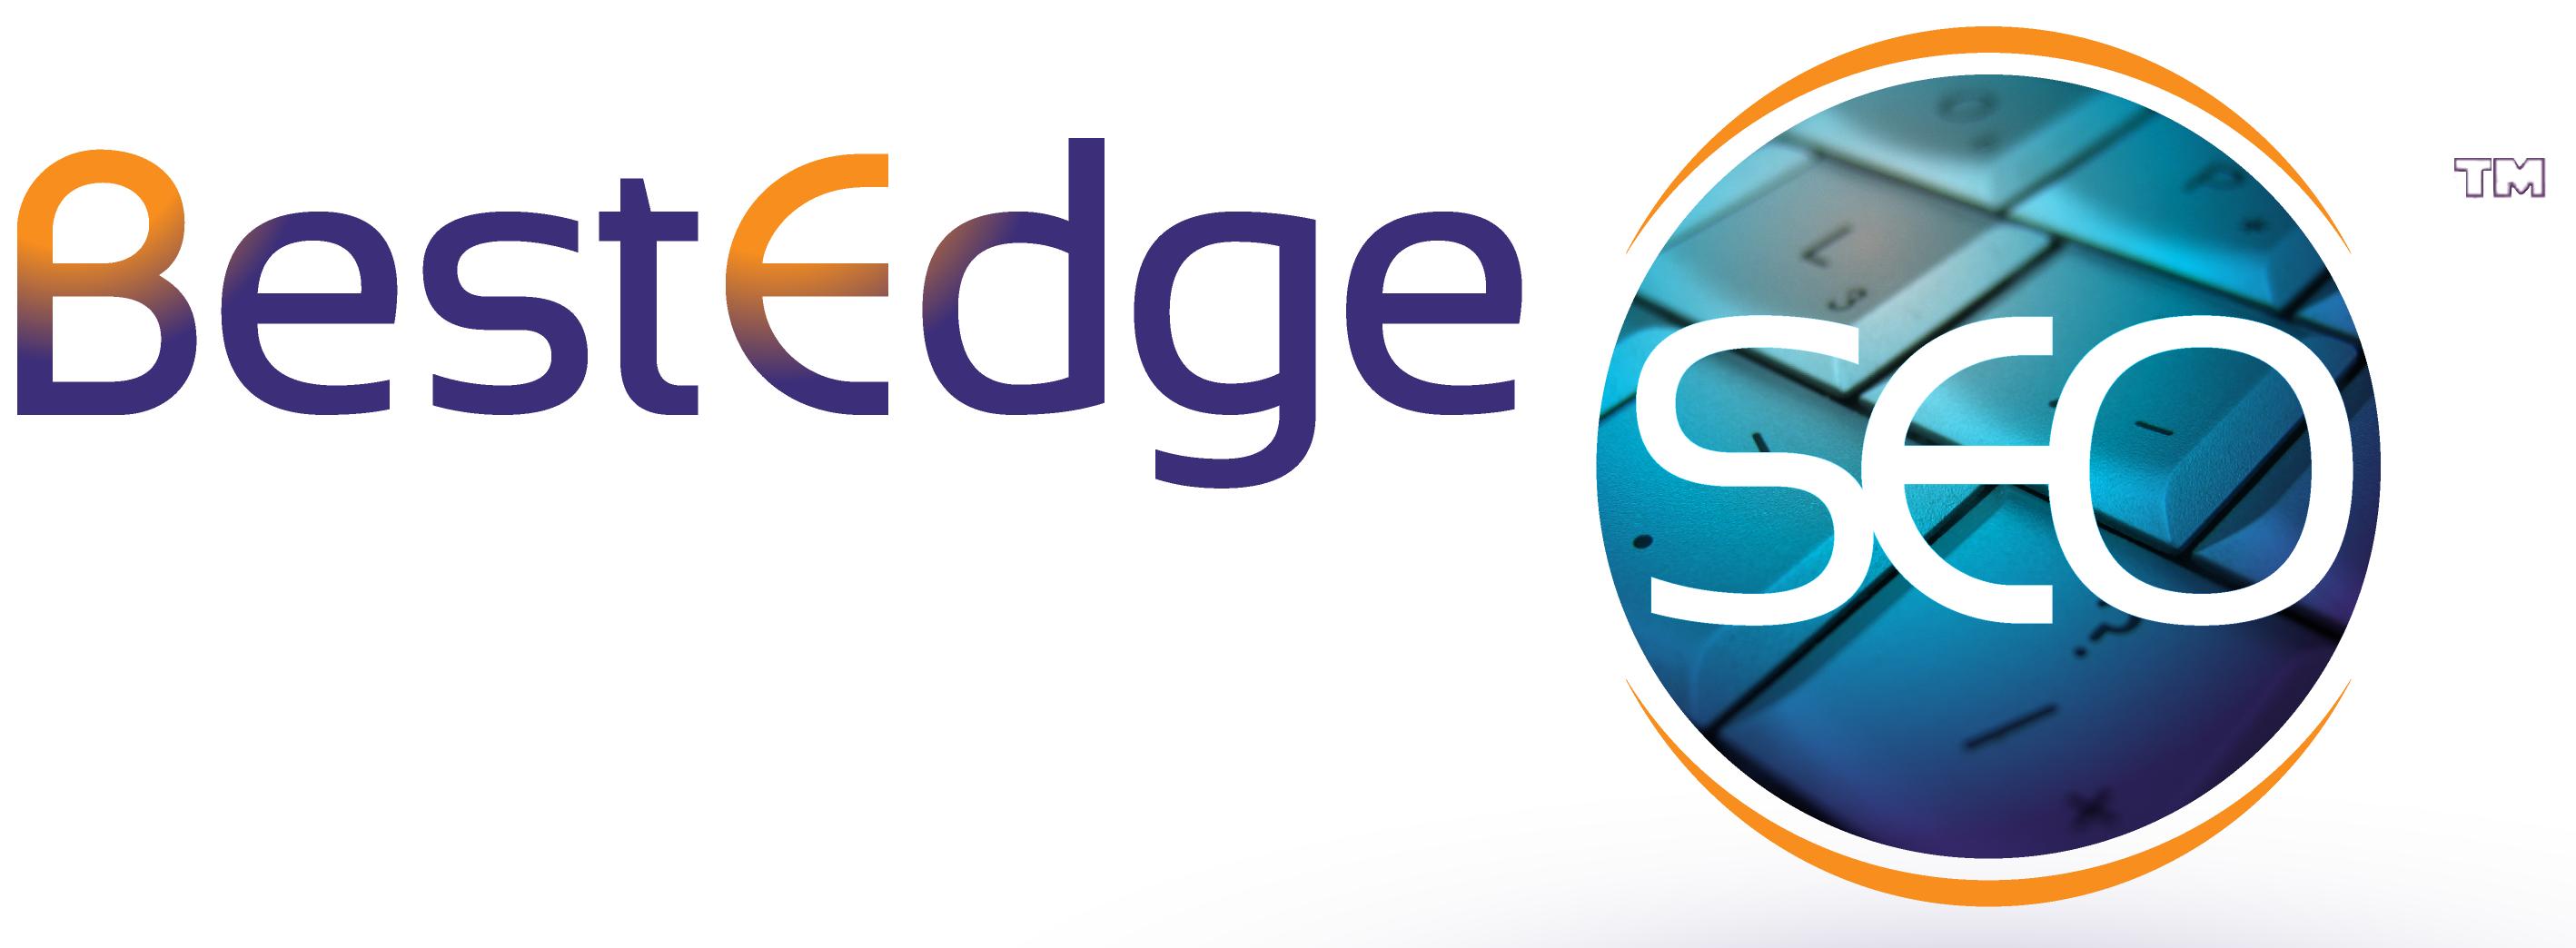 Best Edge SEO Inc - Raleigh, NC -